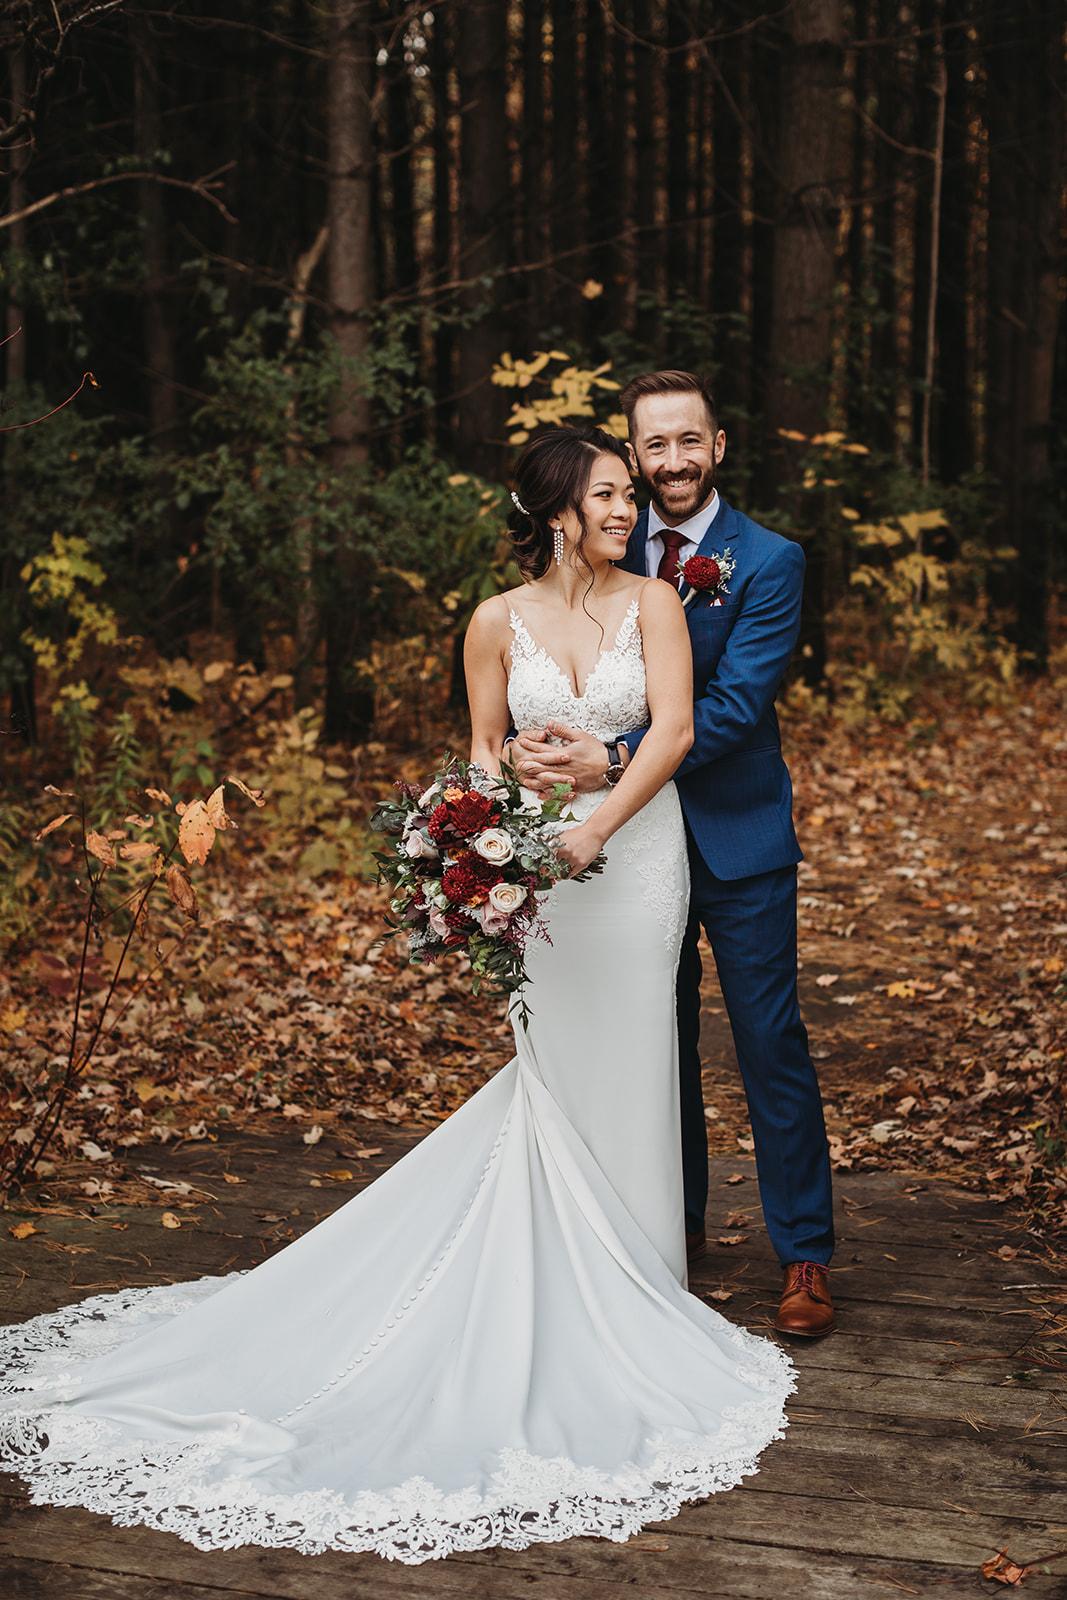 Tips For Choosing A Wedding Dress by Toronto wedding photographer Ten2Ten Photography